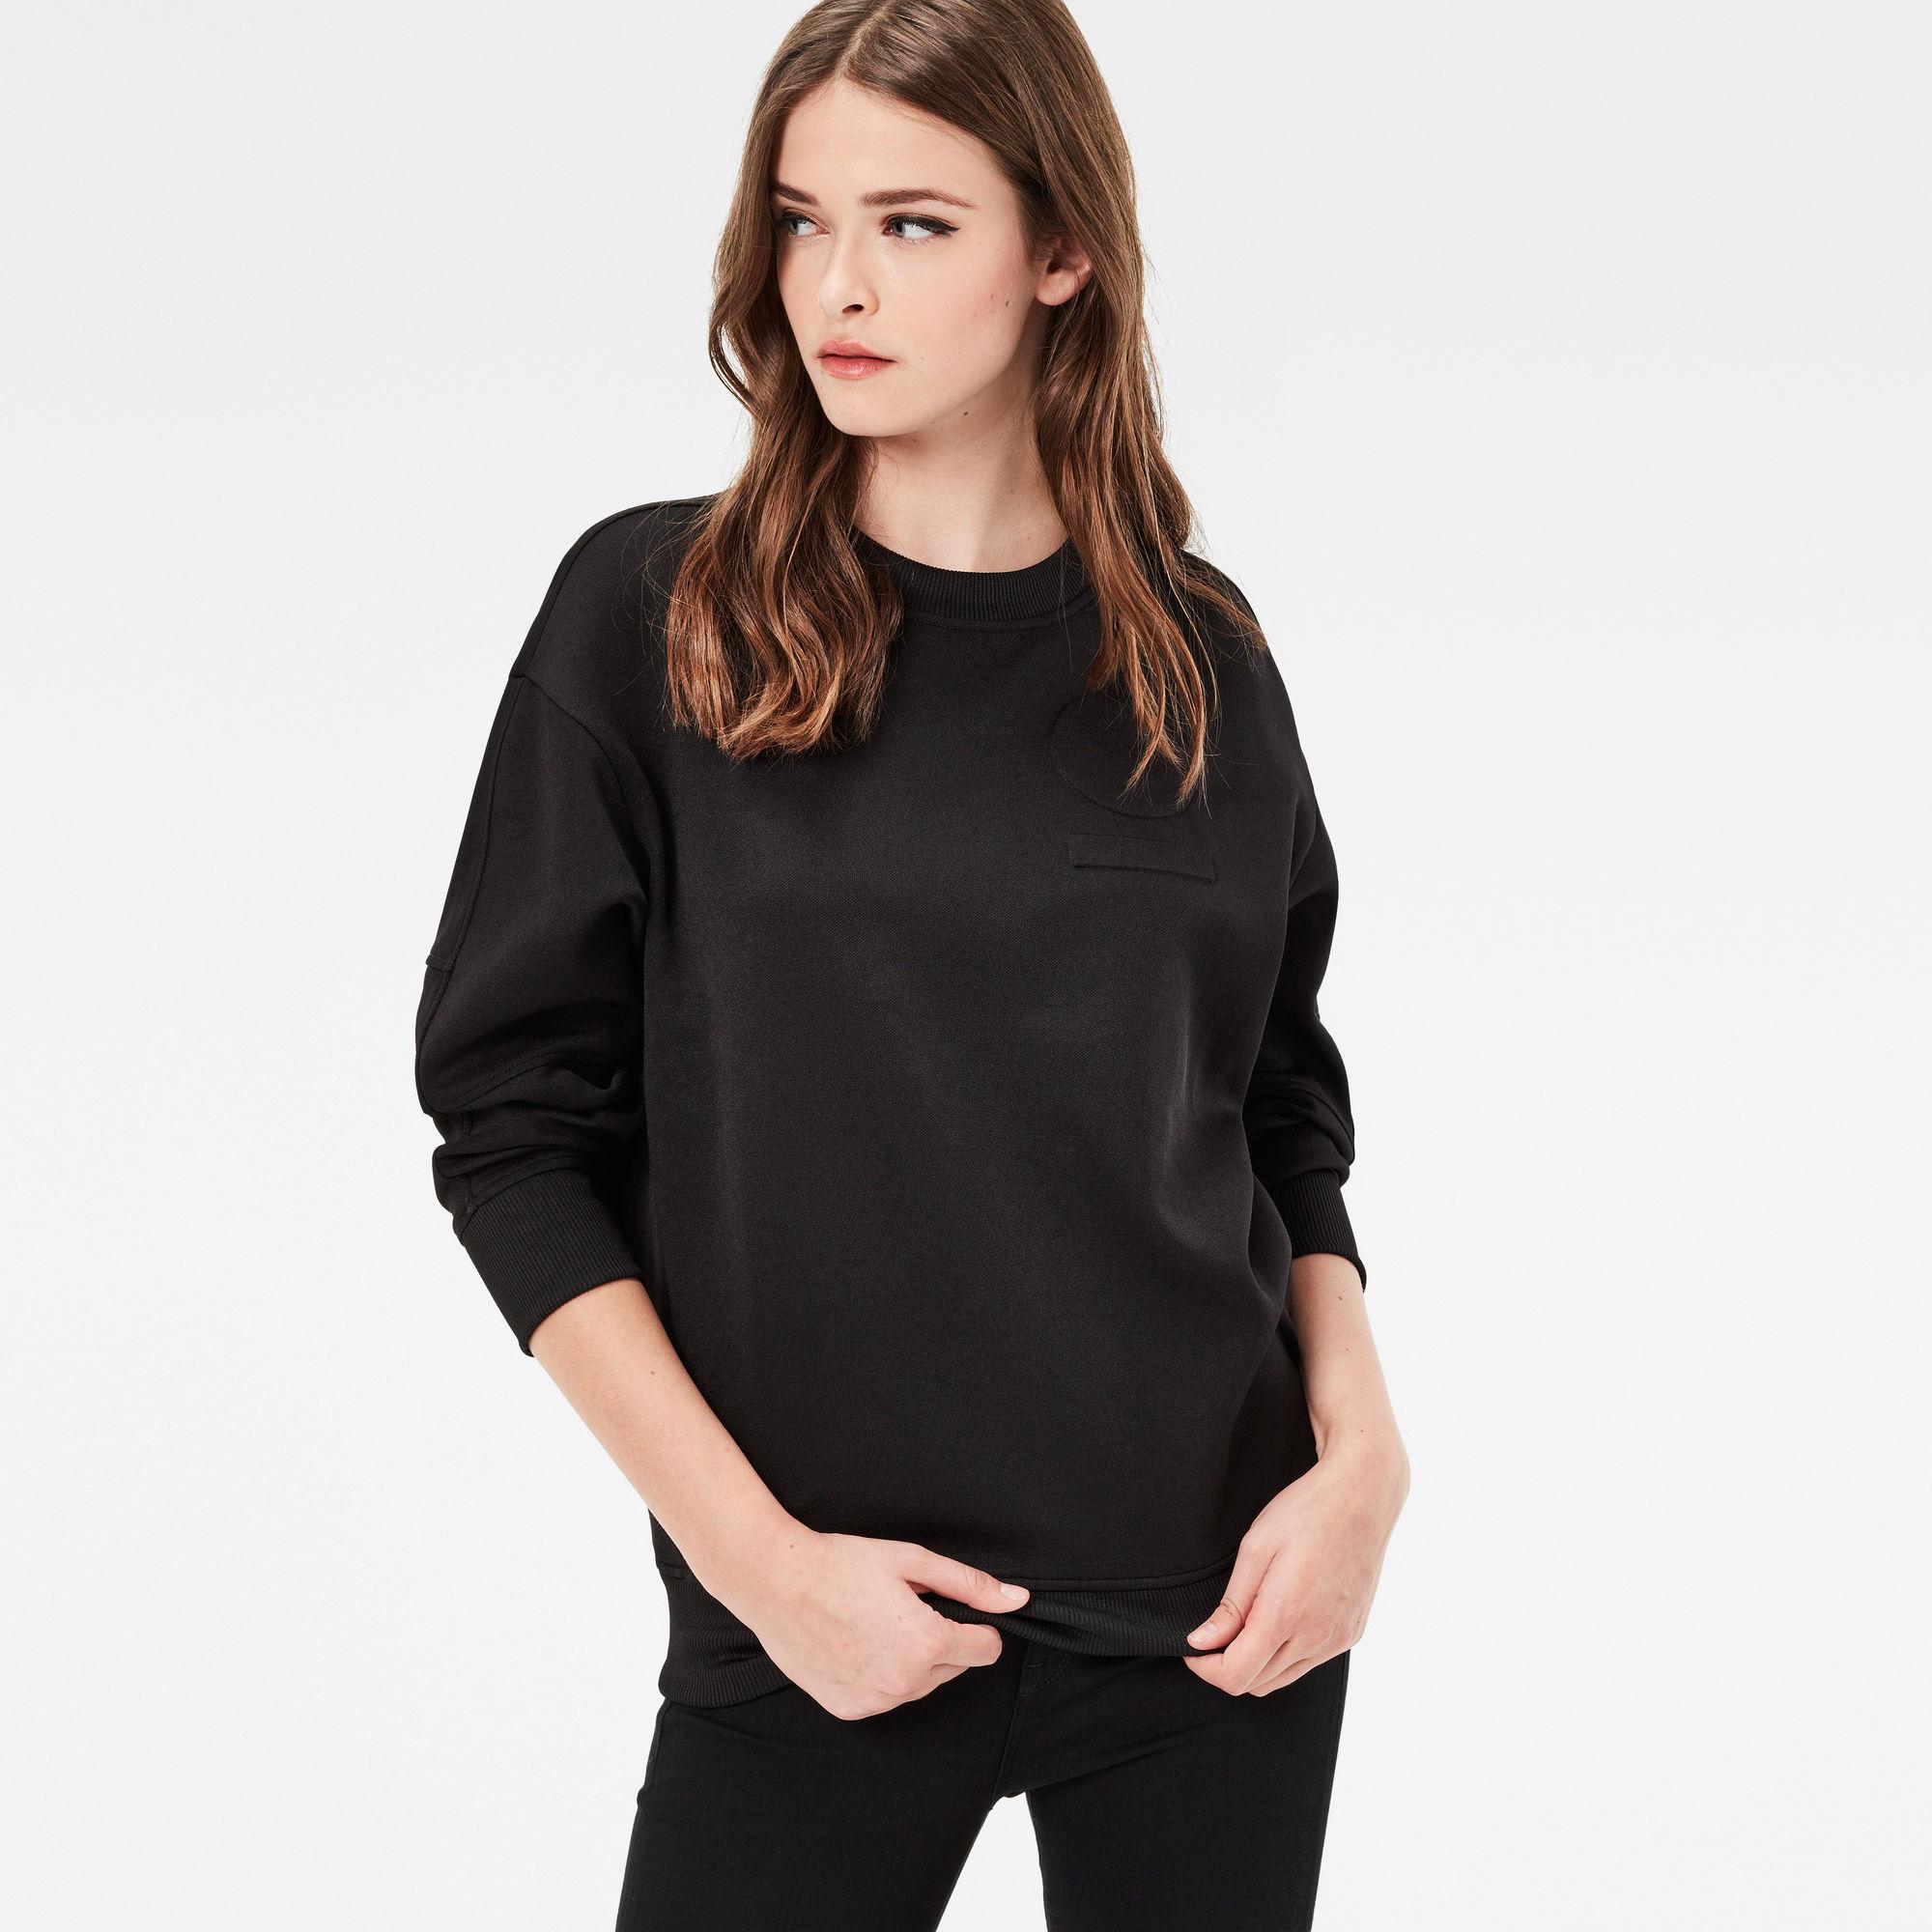 AB XL Sweater